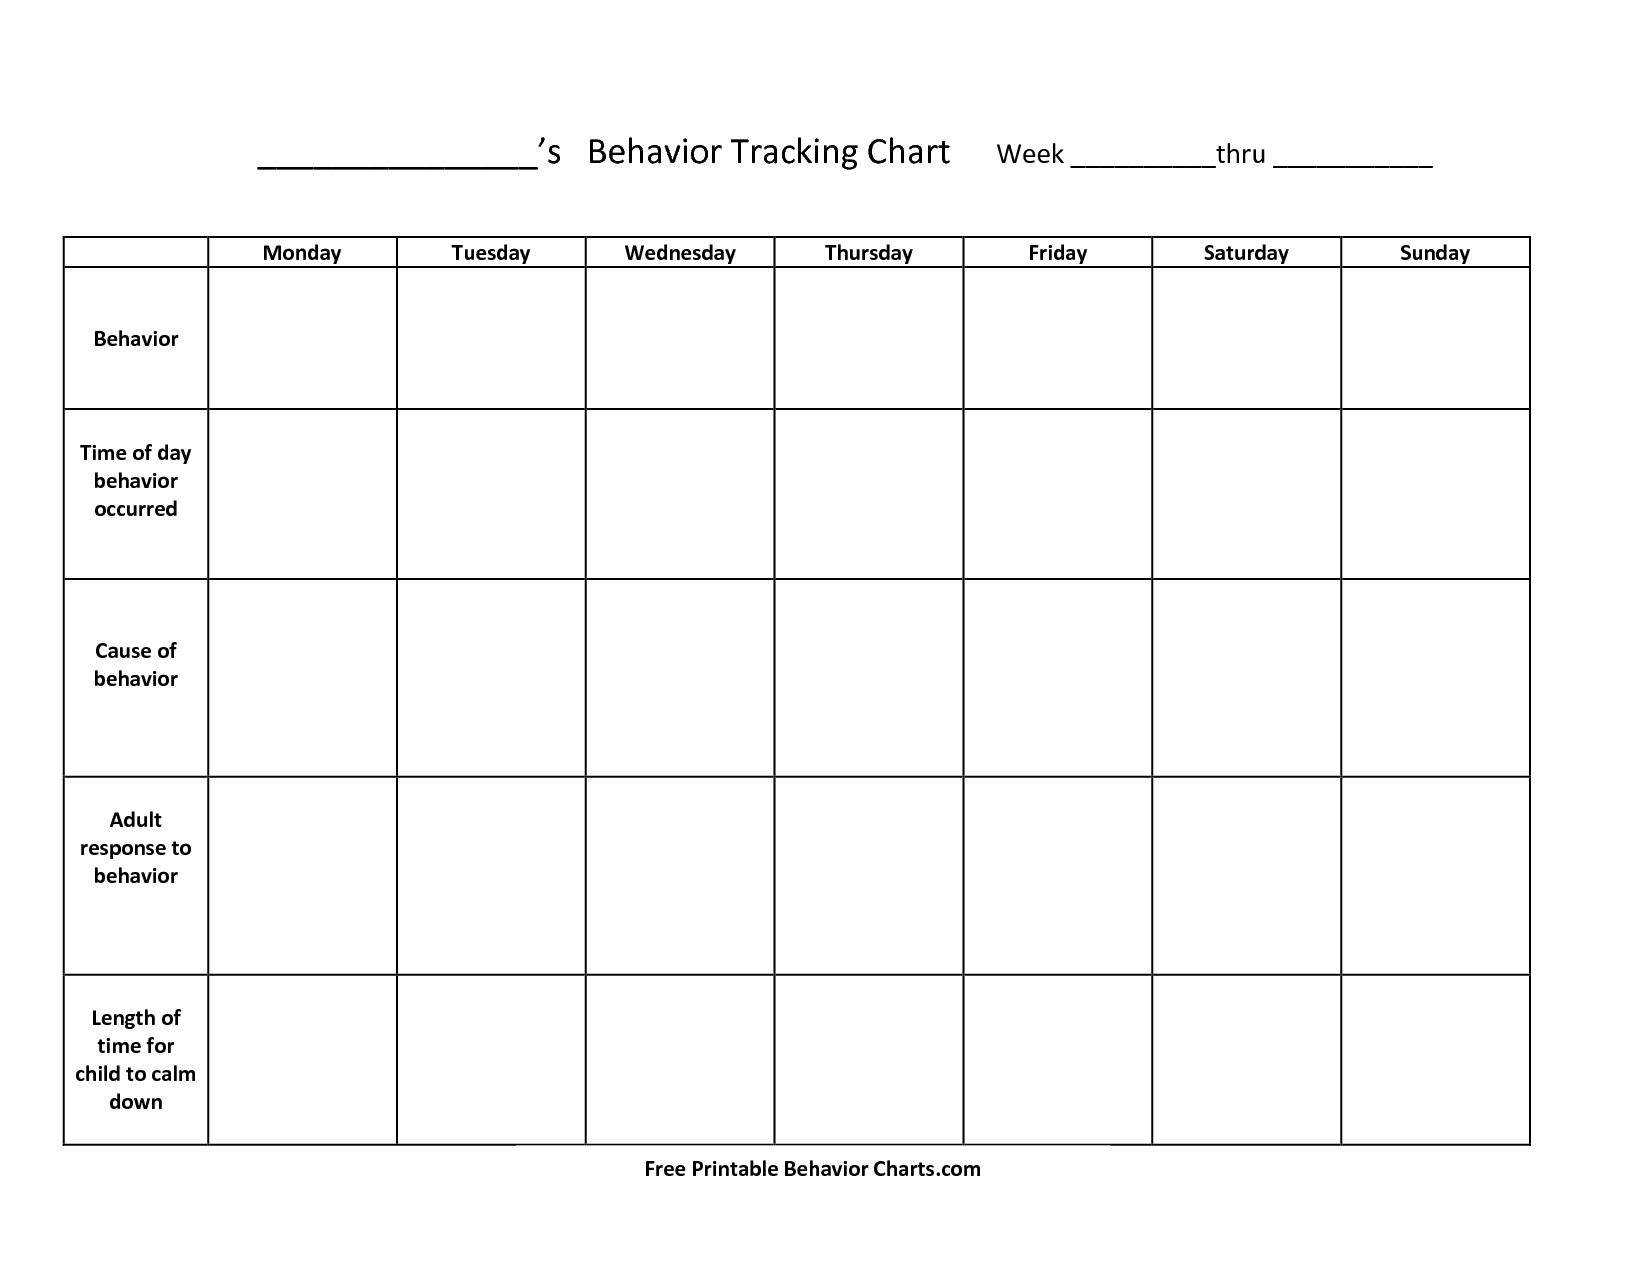 Free+Printable+Behavior+Charts+For+Teachers   Things To Try - Free Printable Charts For Teachers